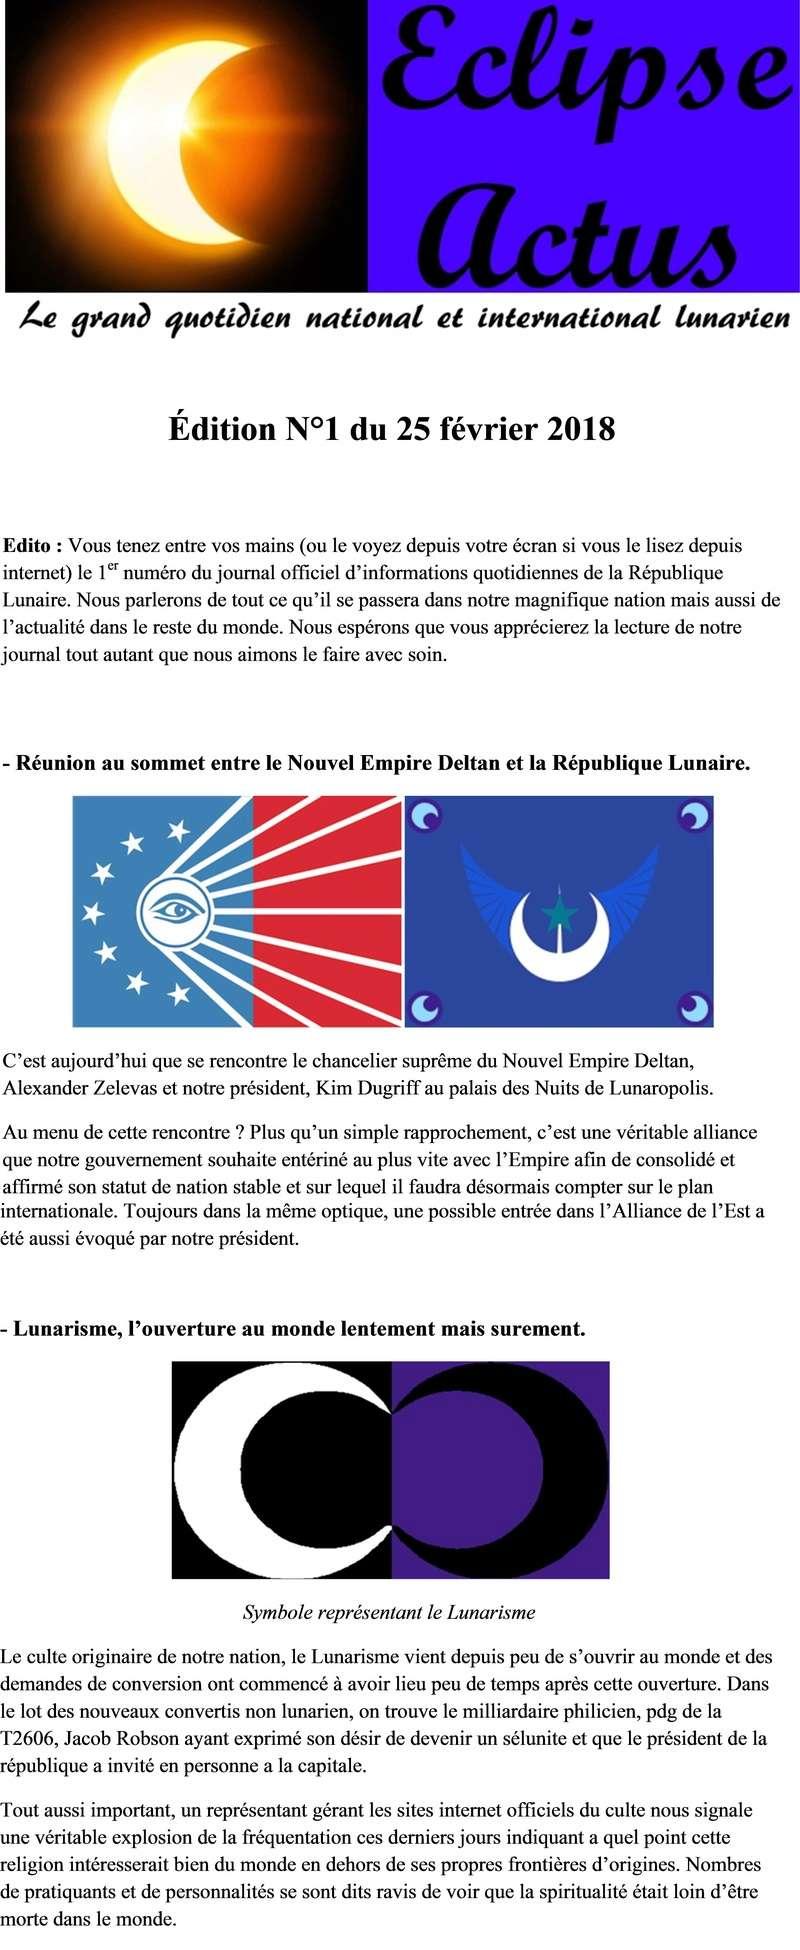 Eclipse Actus Eclips10